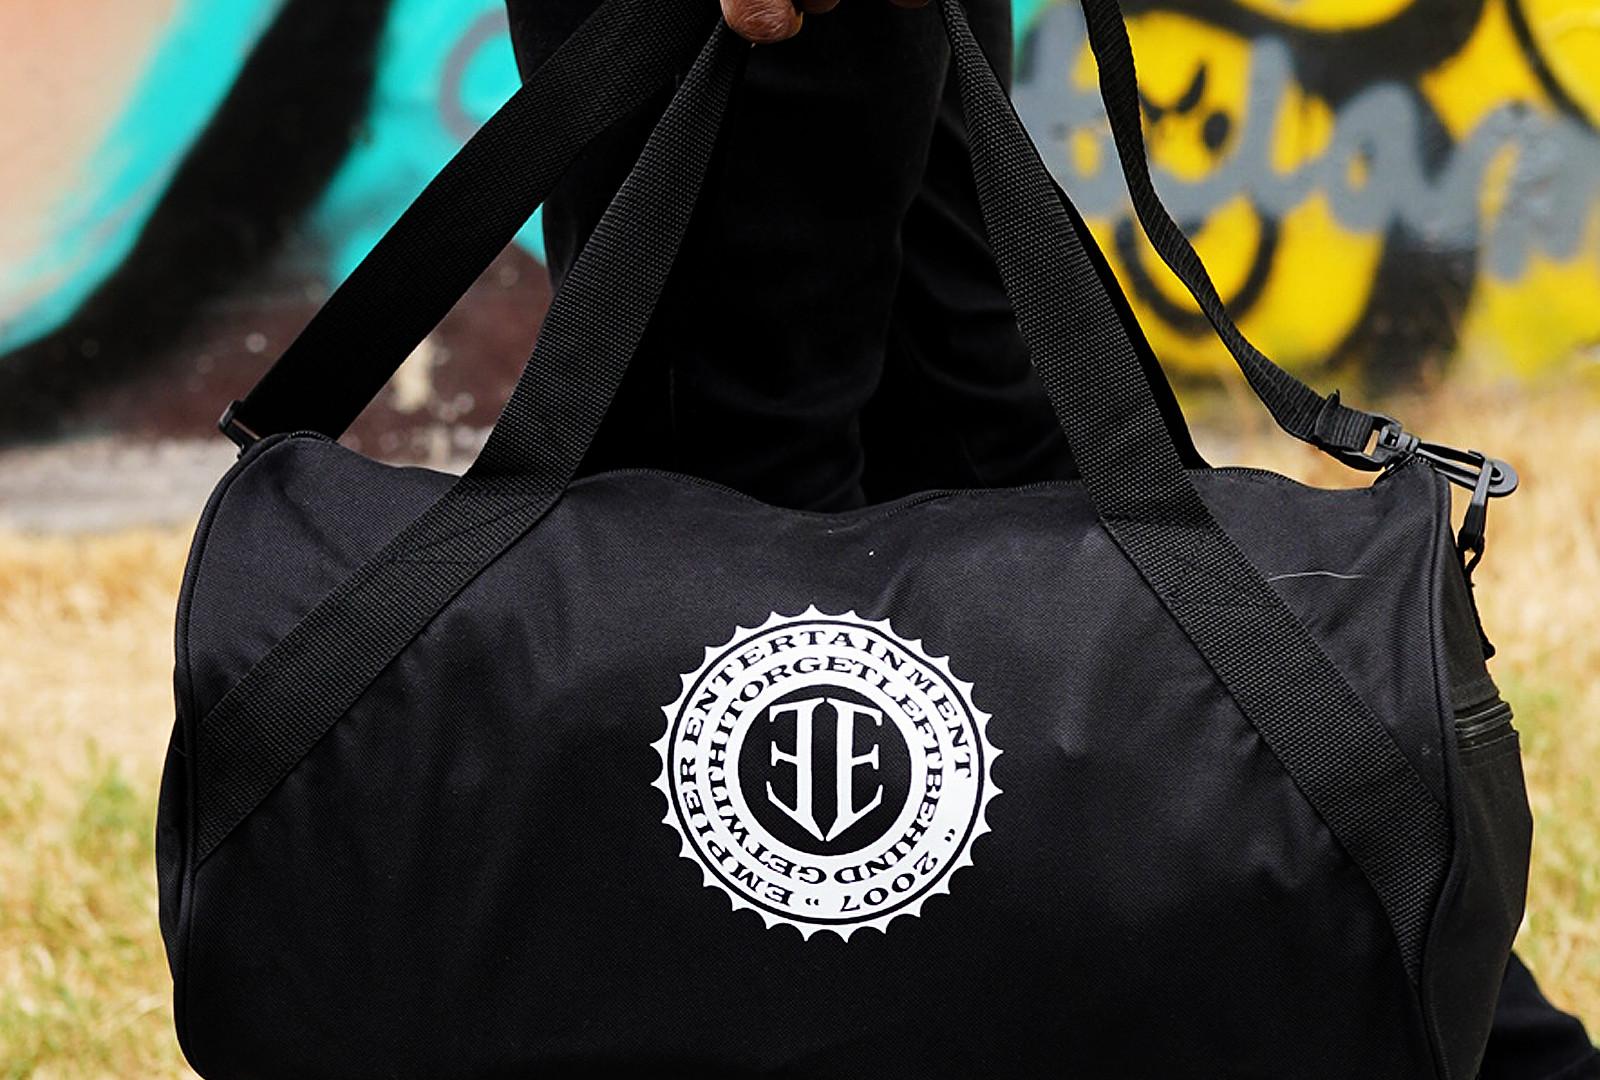 Empier Duffle Bag